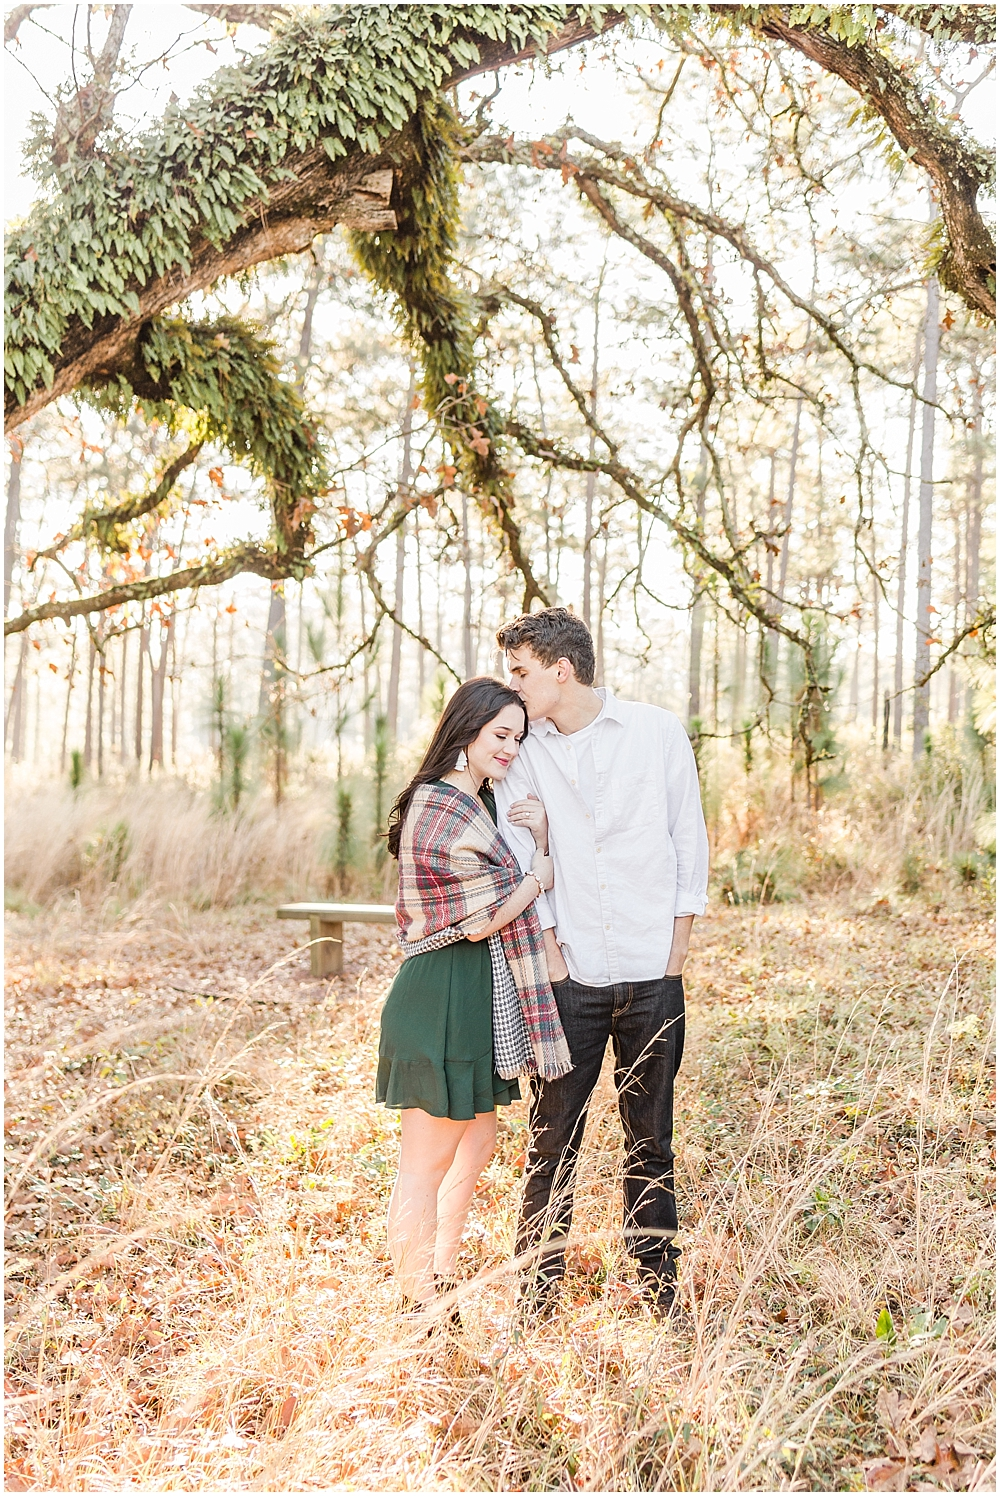 Ashton-Clark-Photography-Wedding-Portrait-Family-Photographer-Mobile-Alabama_0435.jpg